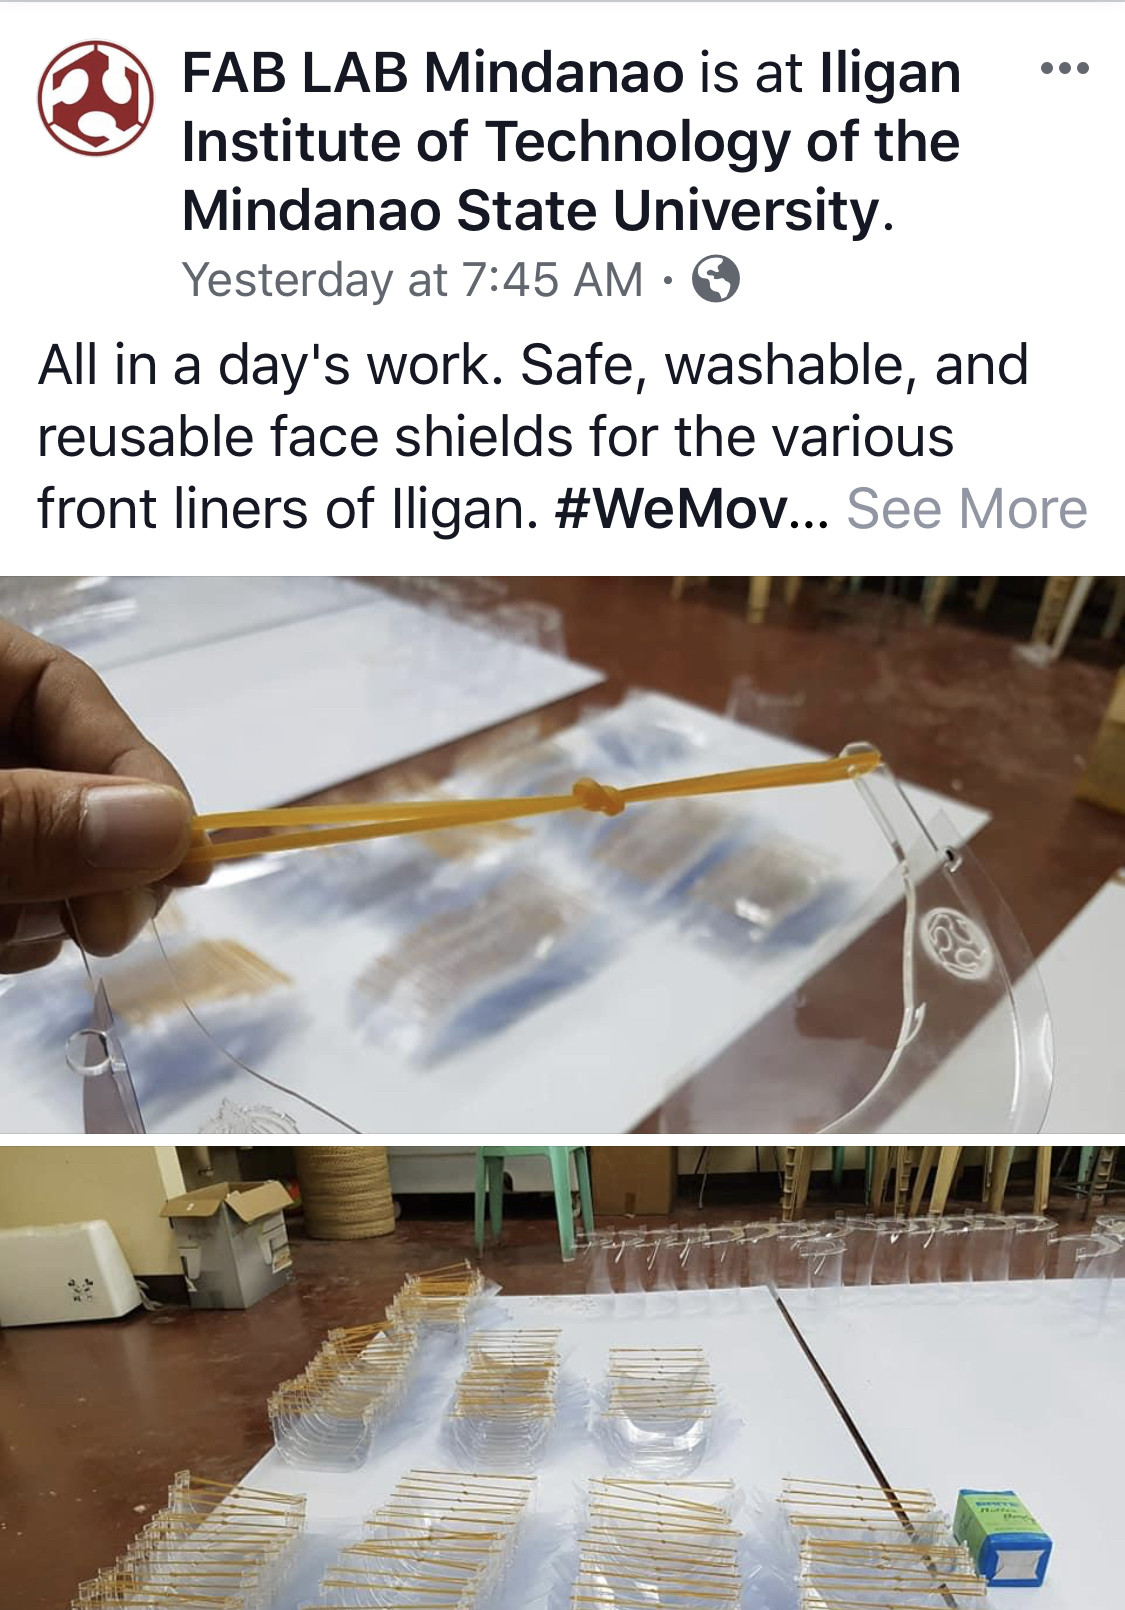 Fab Lab 3D Printed Masks